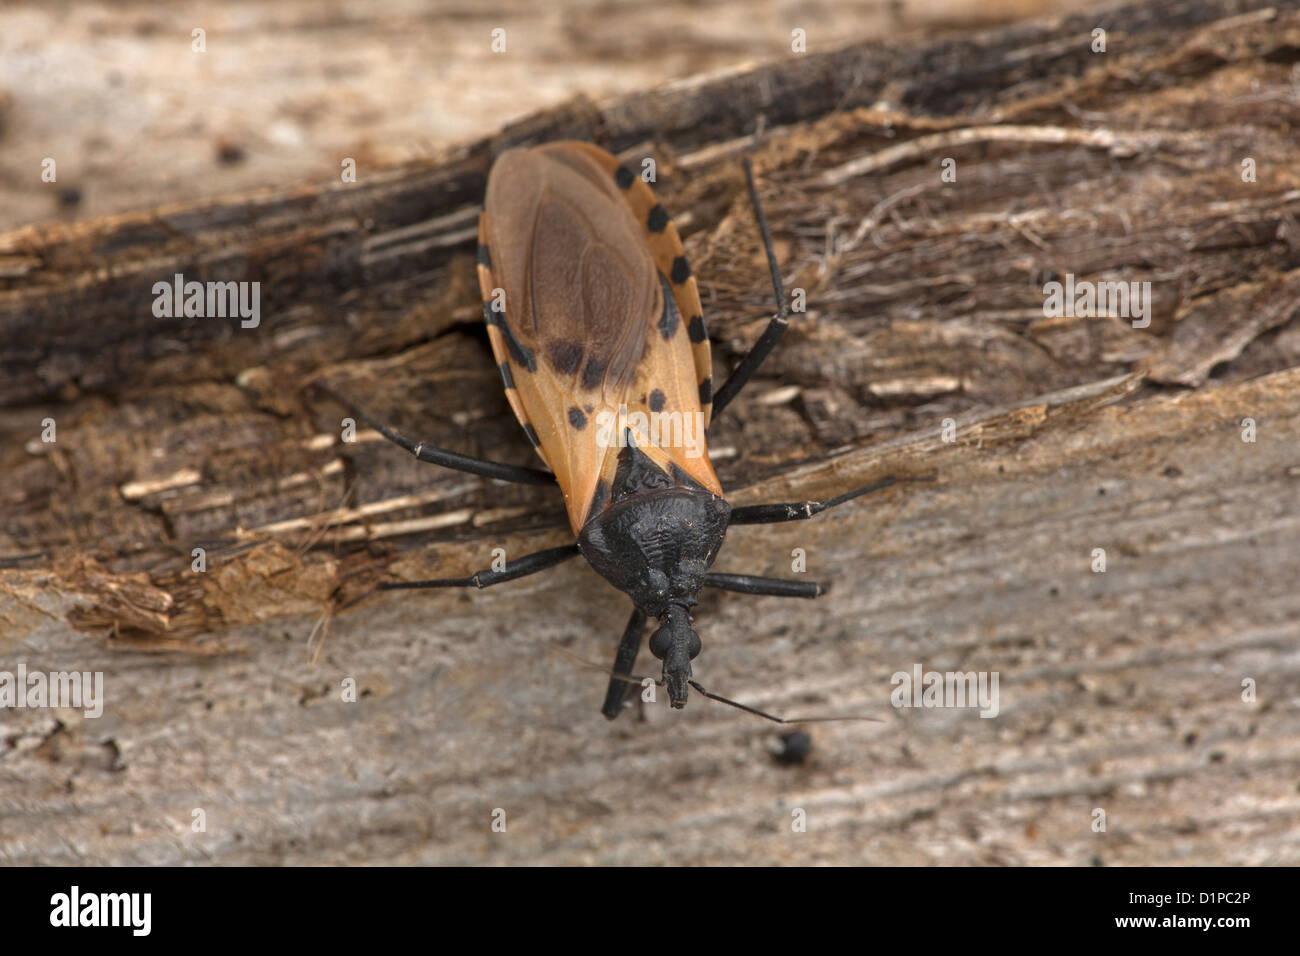 Kissing bug Triatoma dimidiata,the major vector of Trypanosoma cruzi in Costa Rica,  Transmits Chagas' disease,family - Stock Image